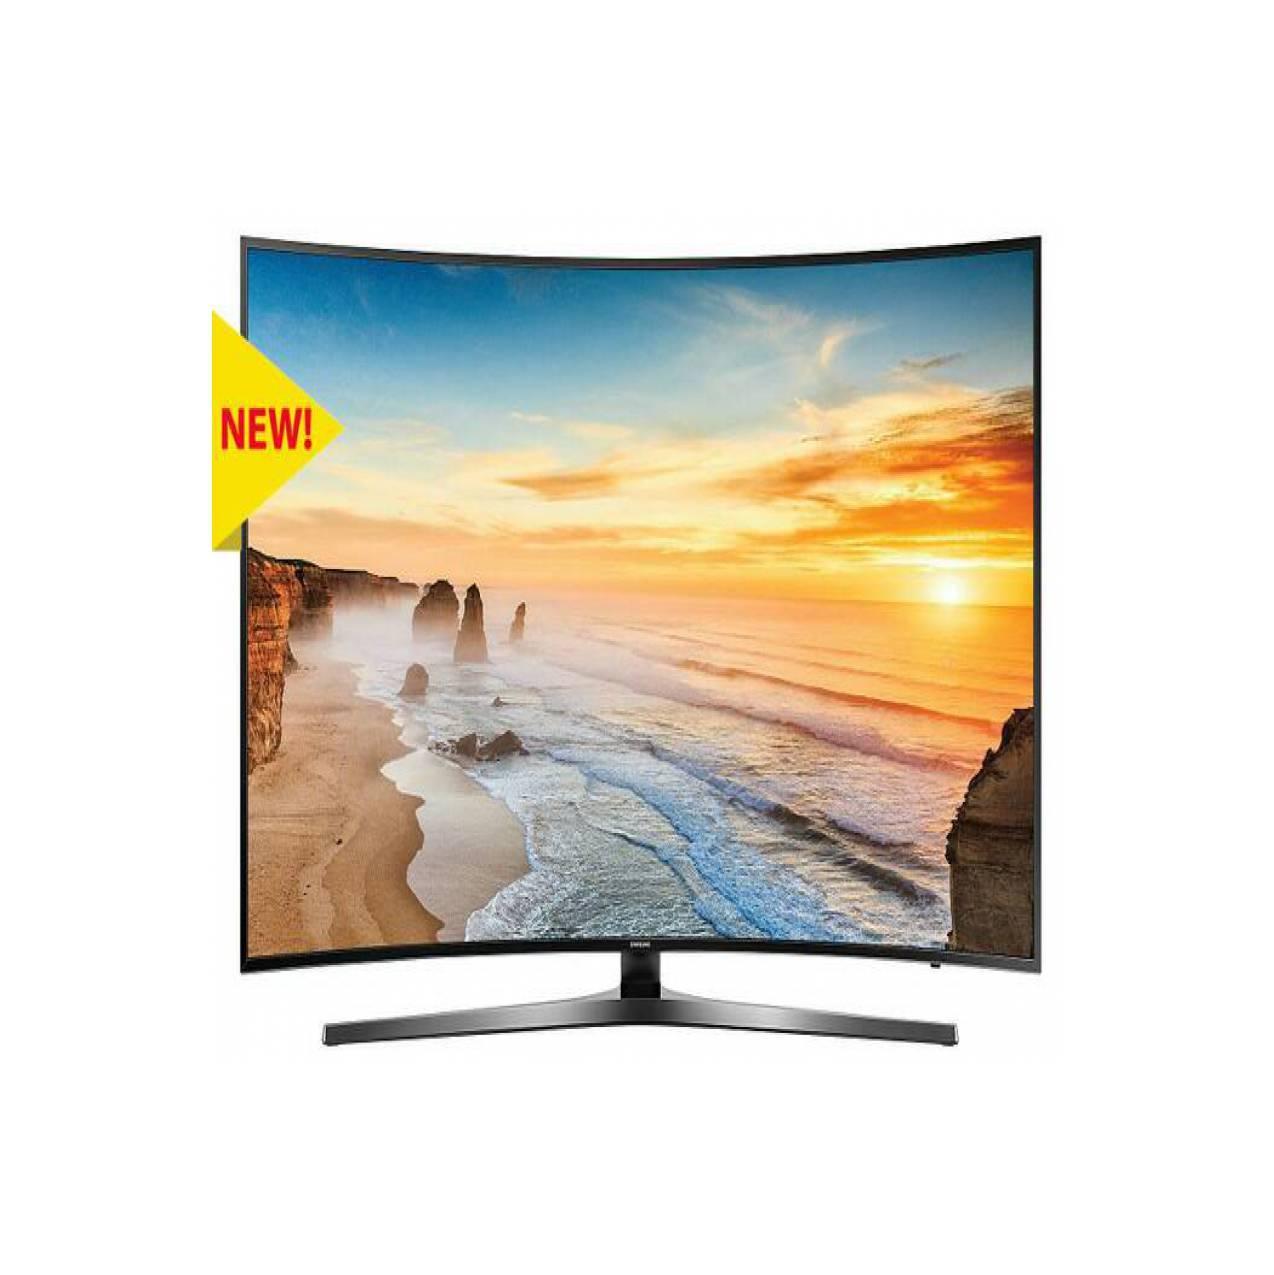 Samsung 55KU6500 55 Inch UHD 4K Curved Smart TV